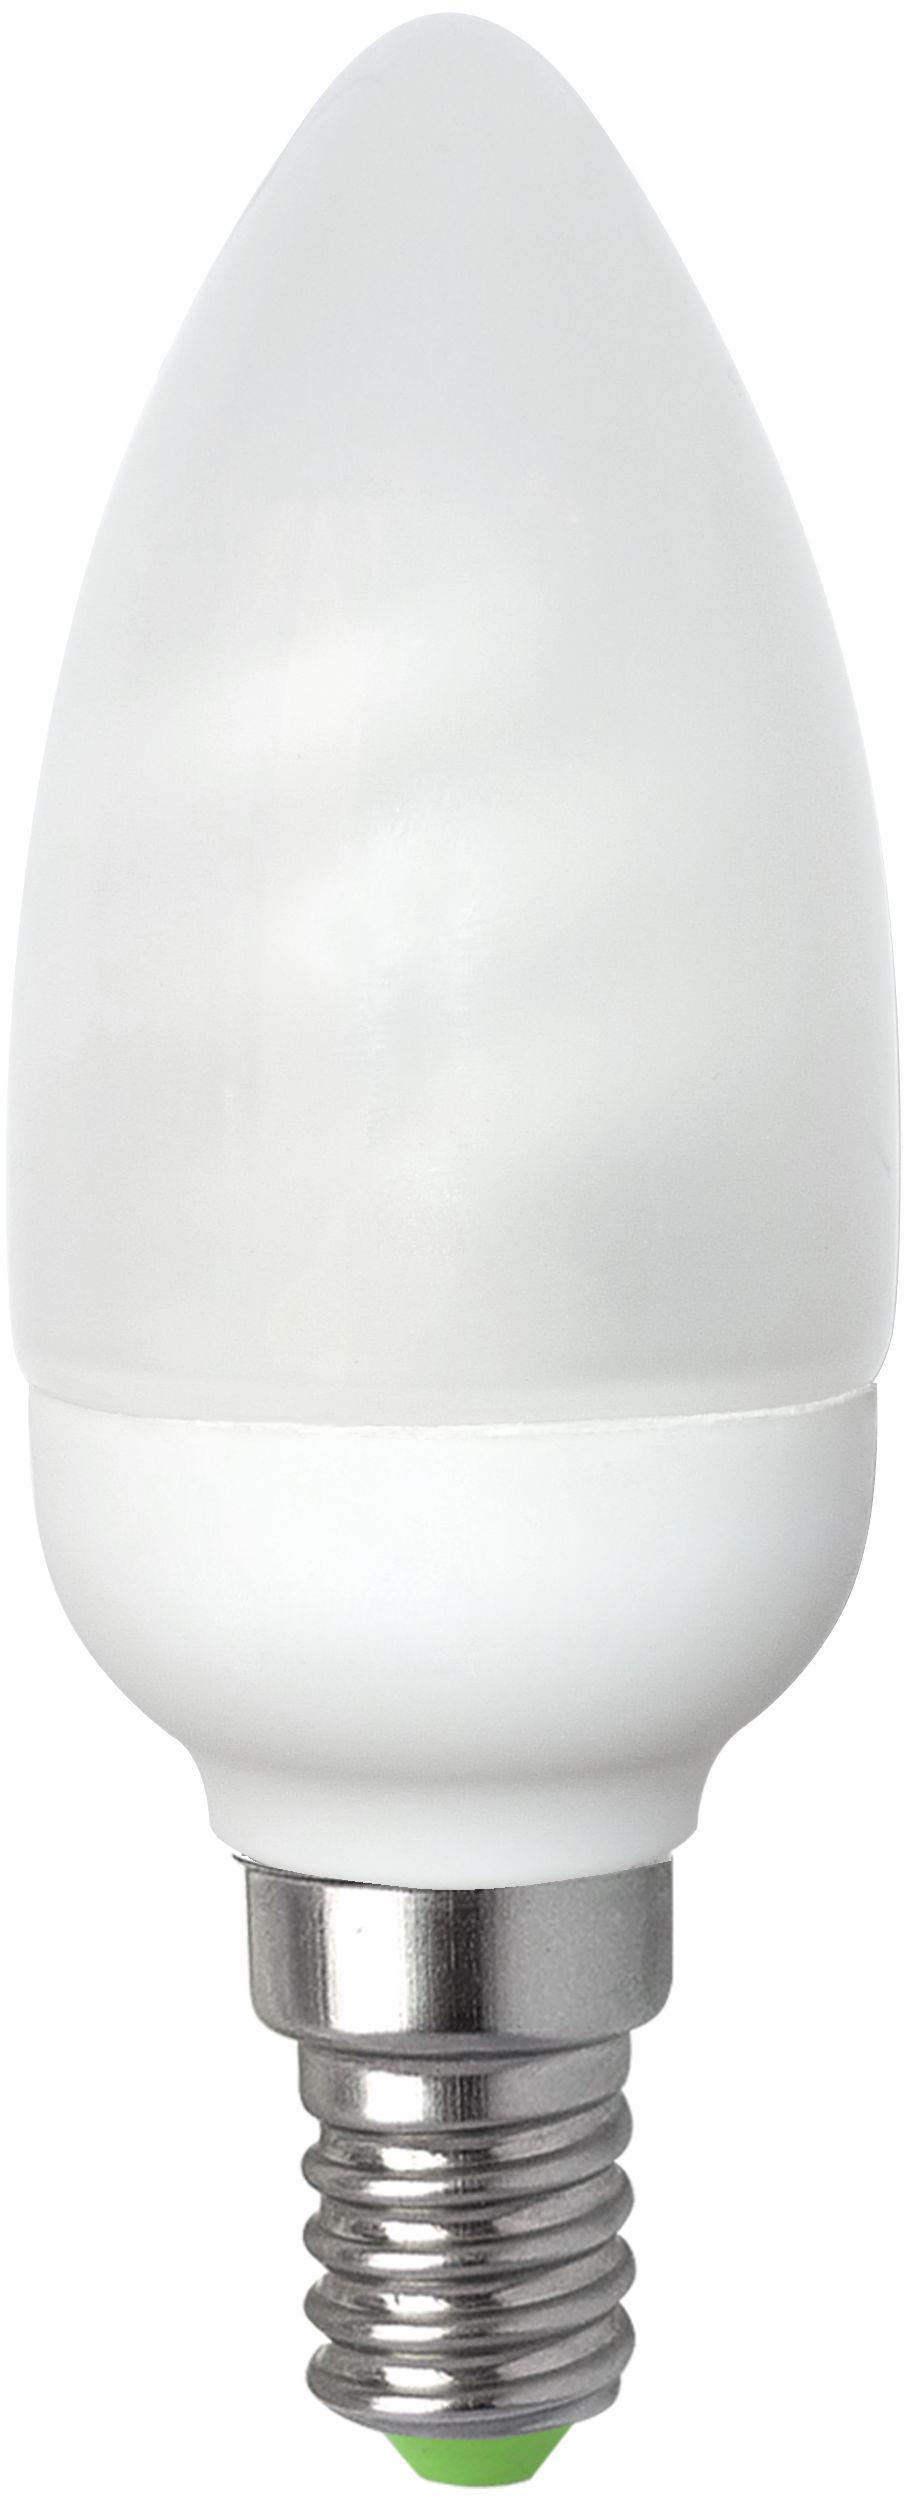 RETLUX RFL 20 žárovka candle C37 7W E14